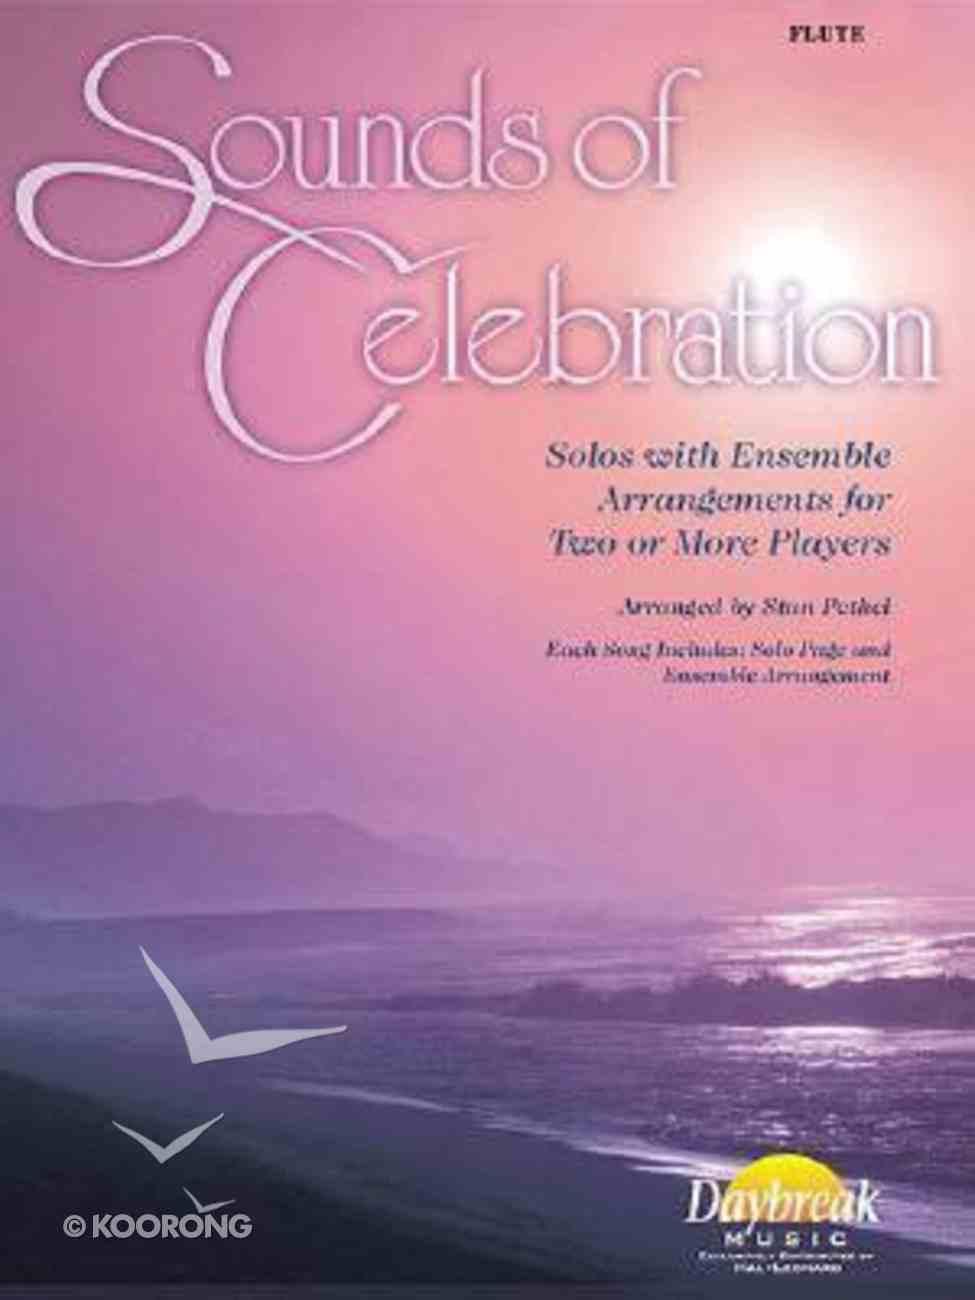 Sounds of Celebration Volume 1 (Flute) Paperback